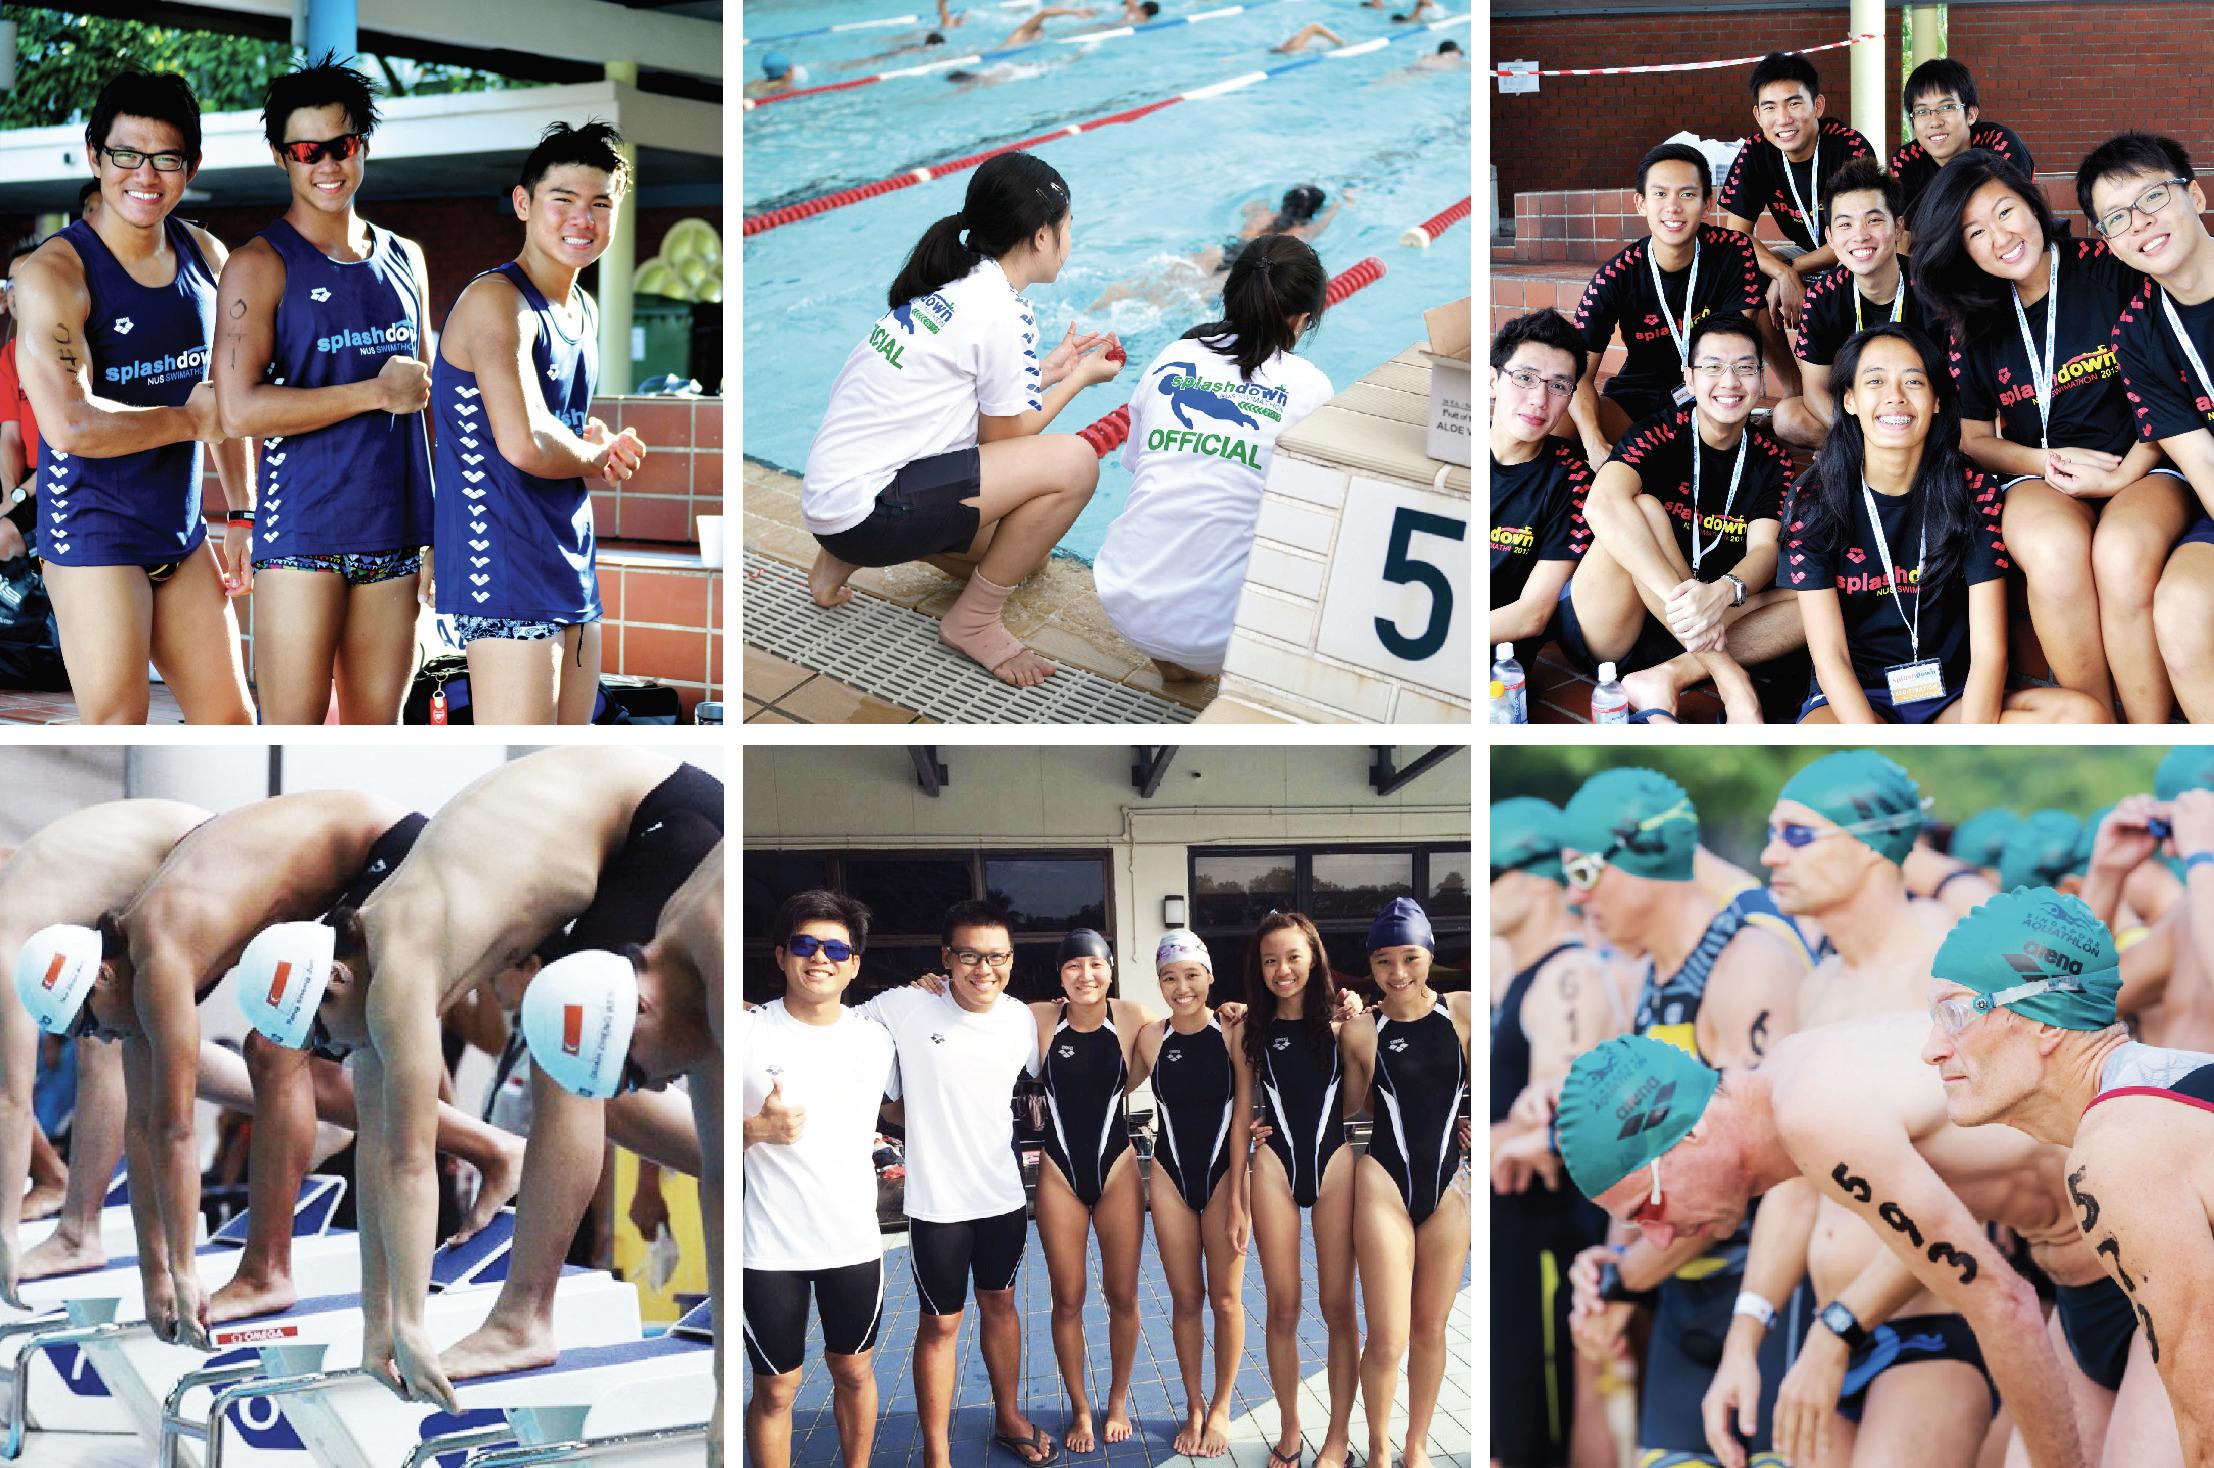 Teamcustomization-swimwear